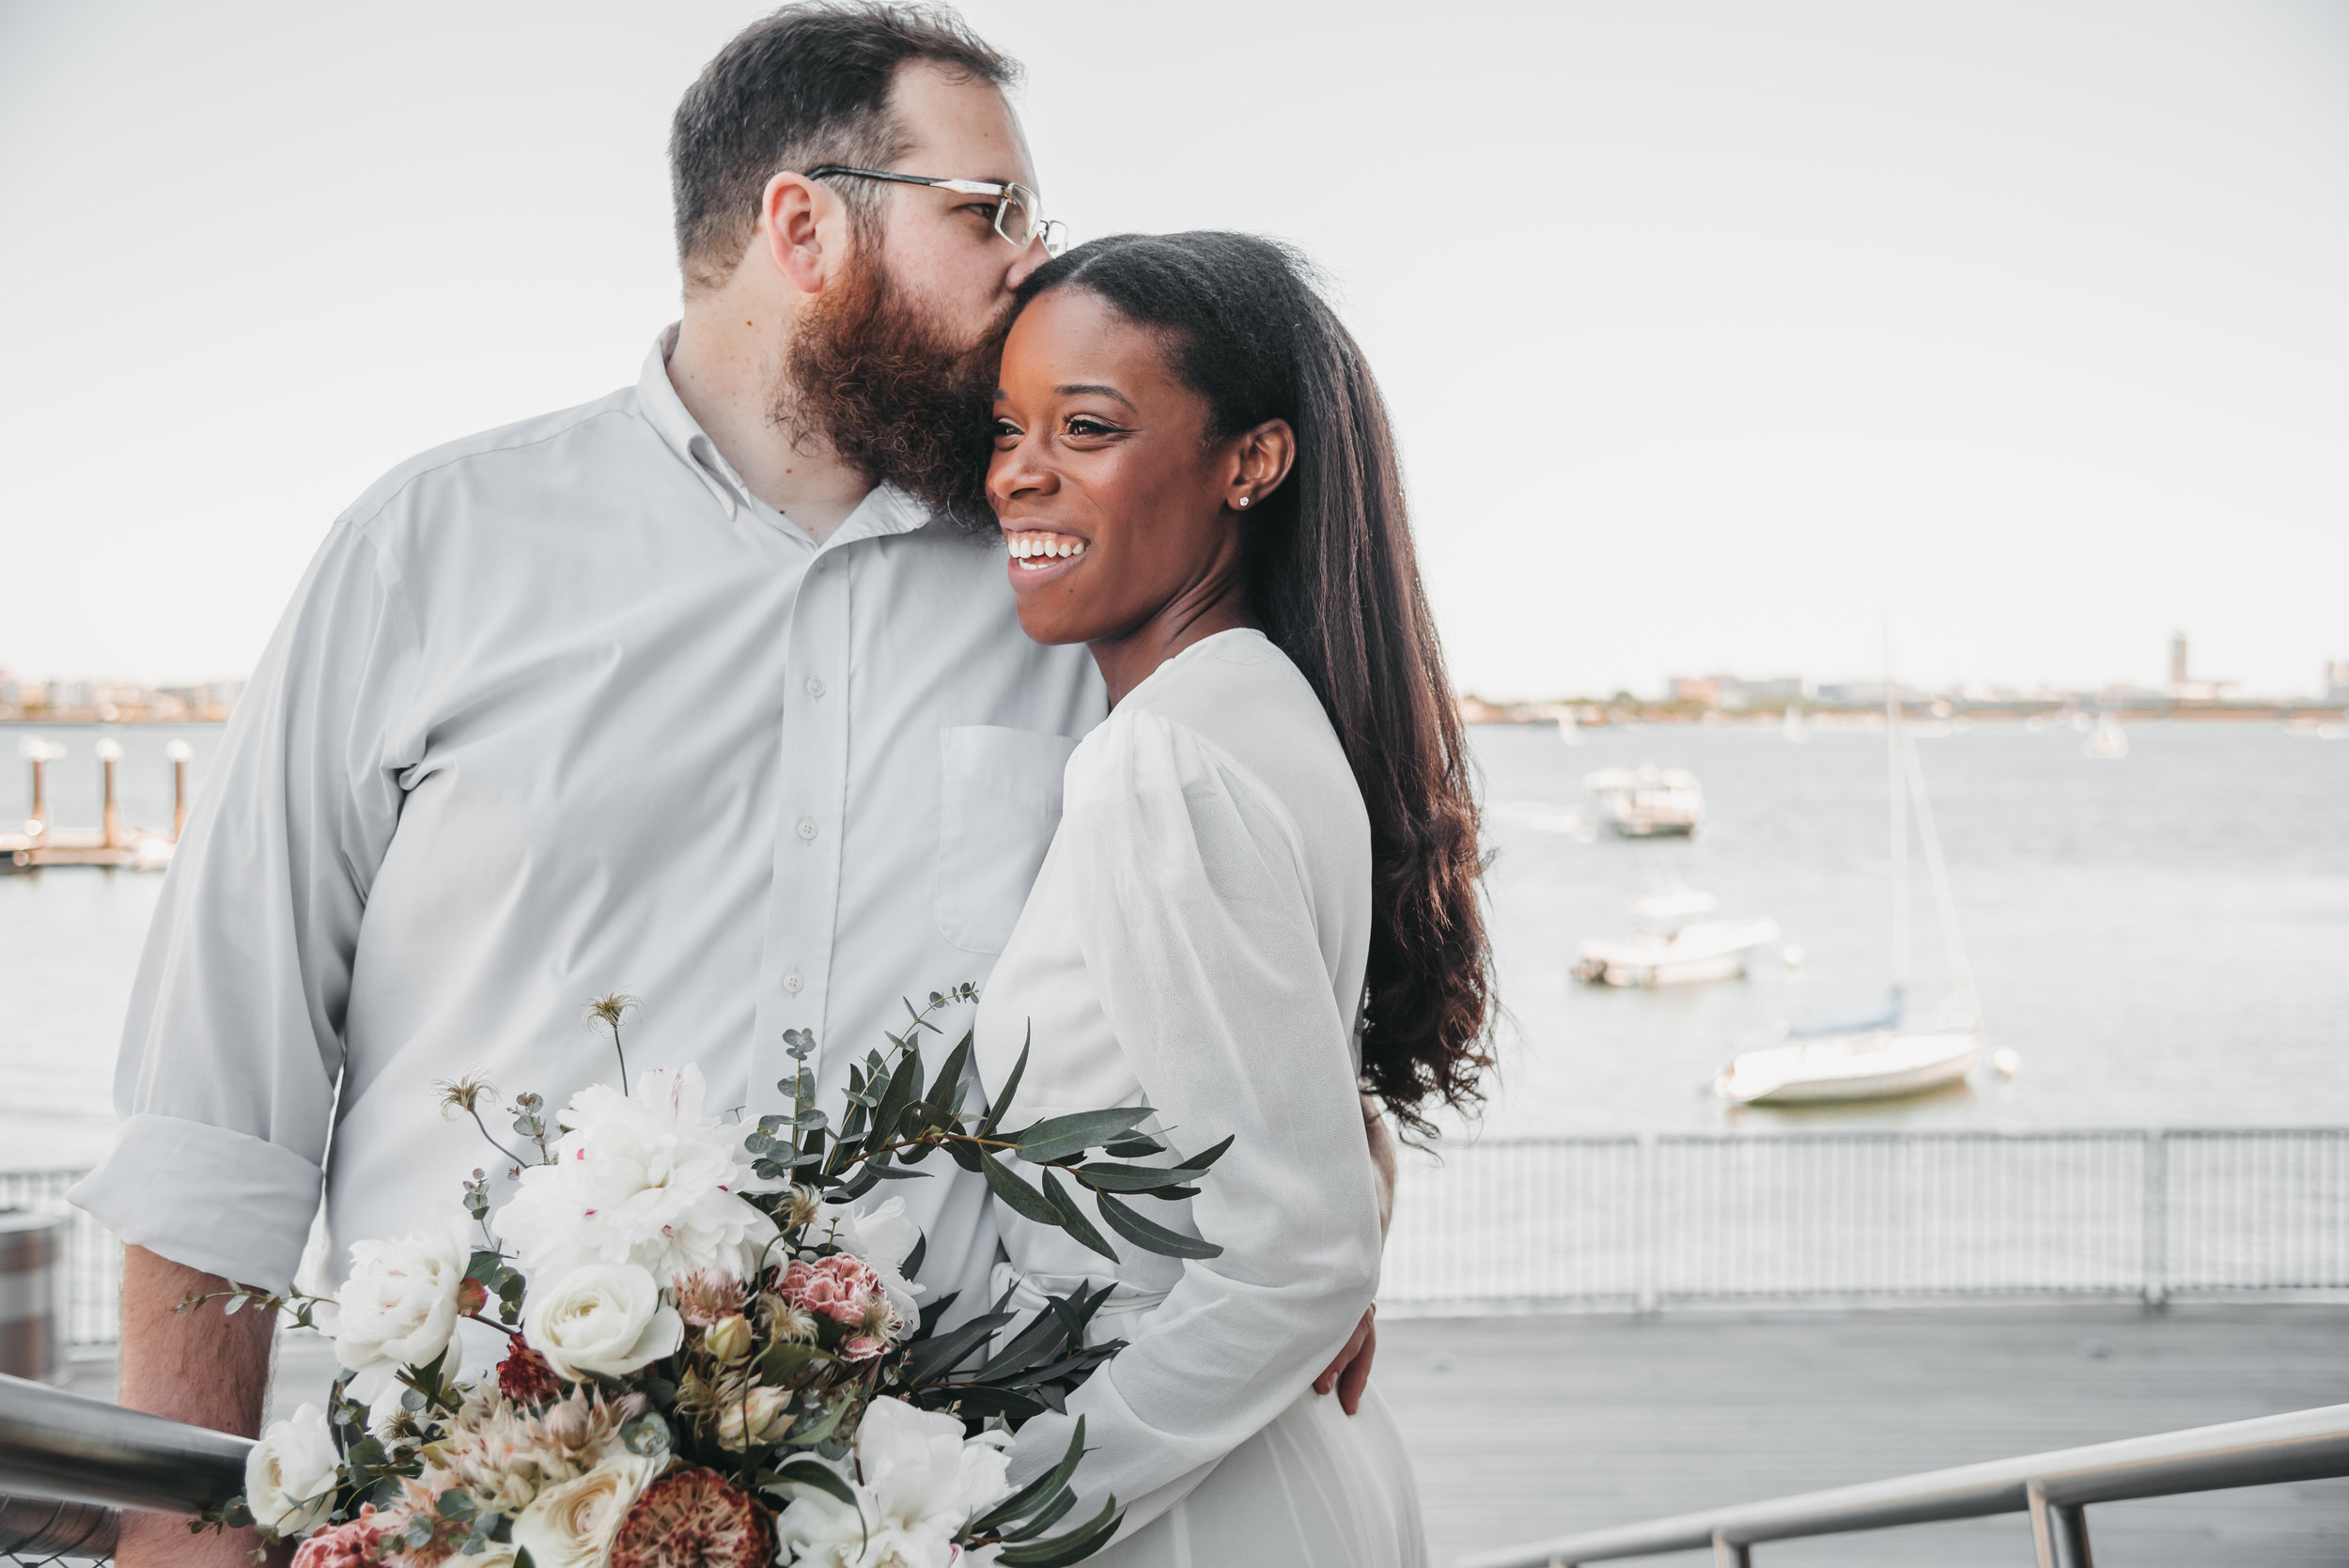 seaport-romantic-boston-elopement-87.jpg